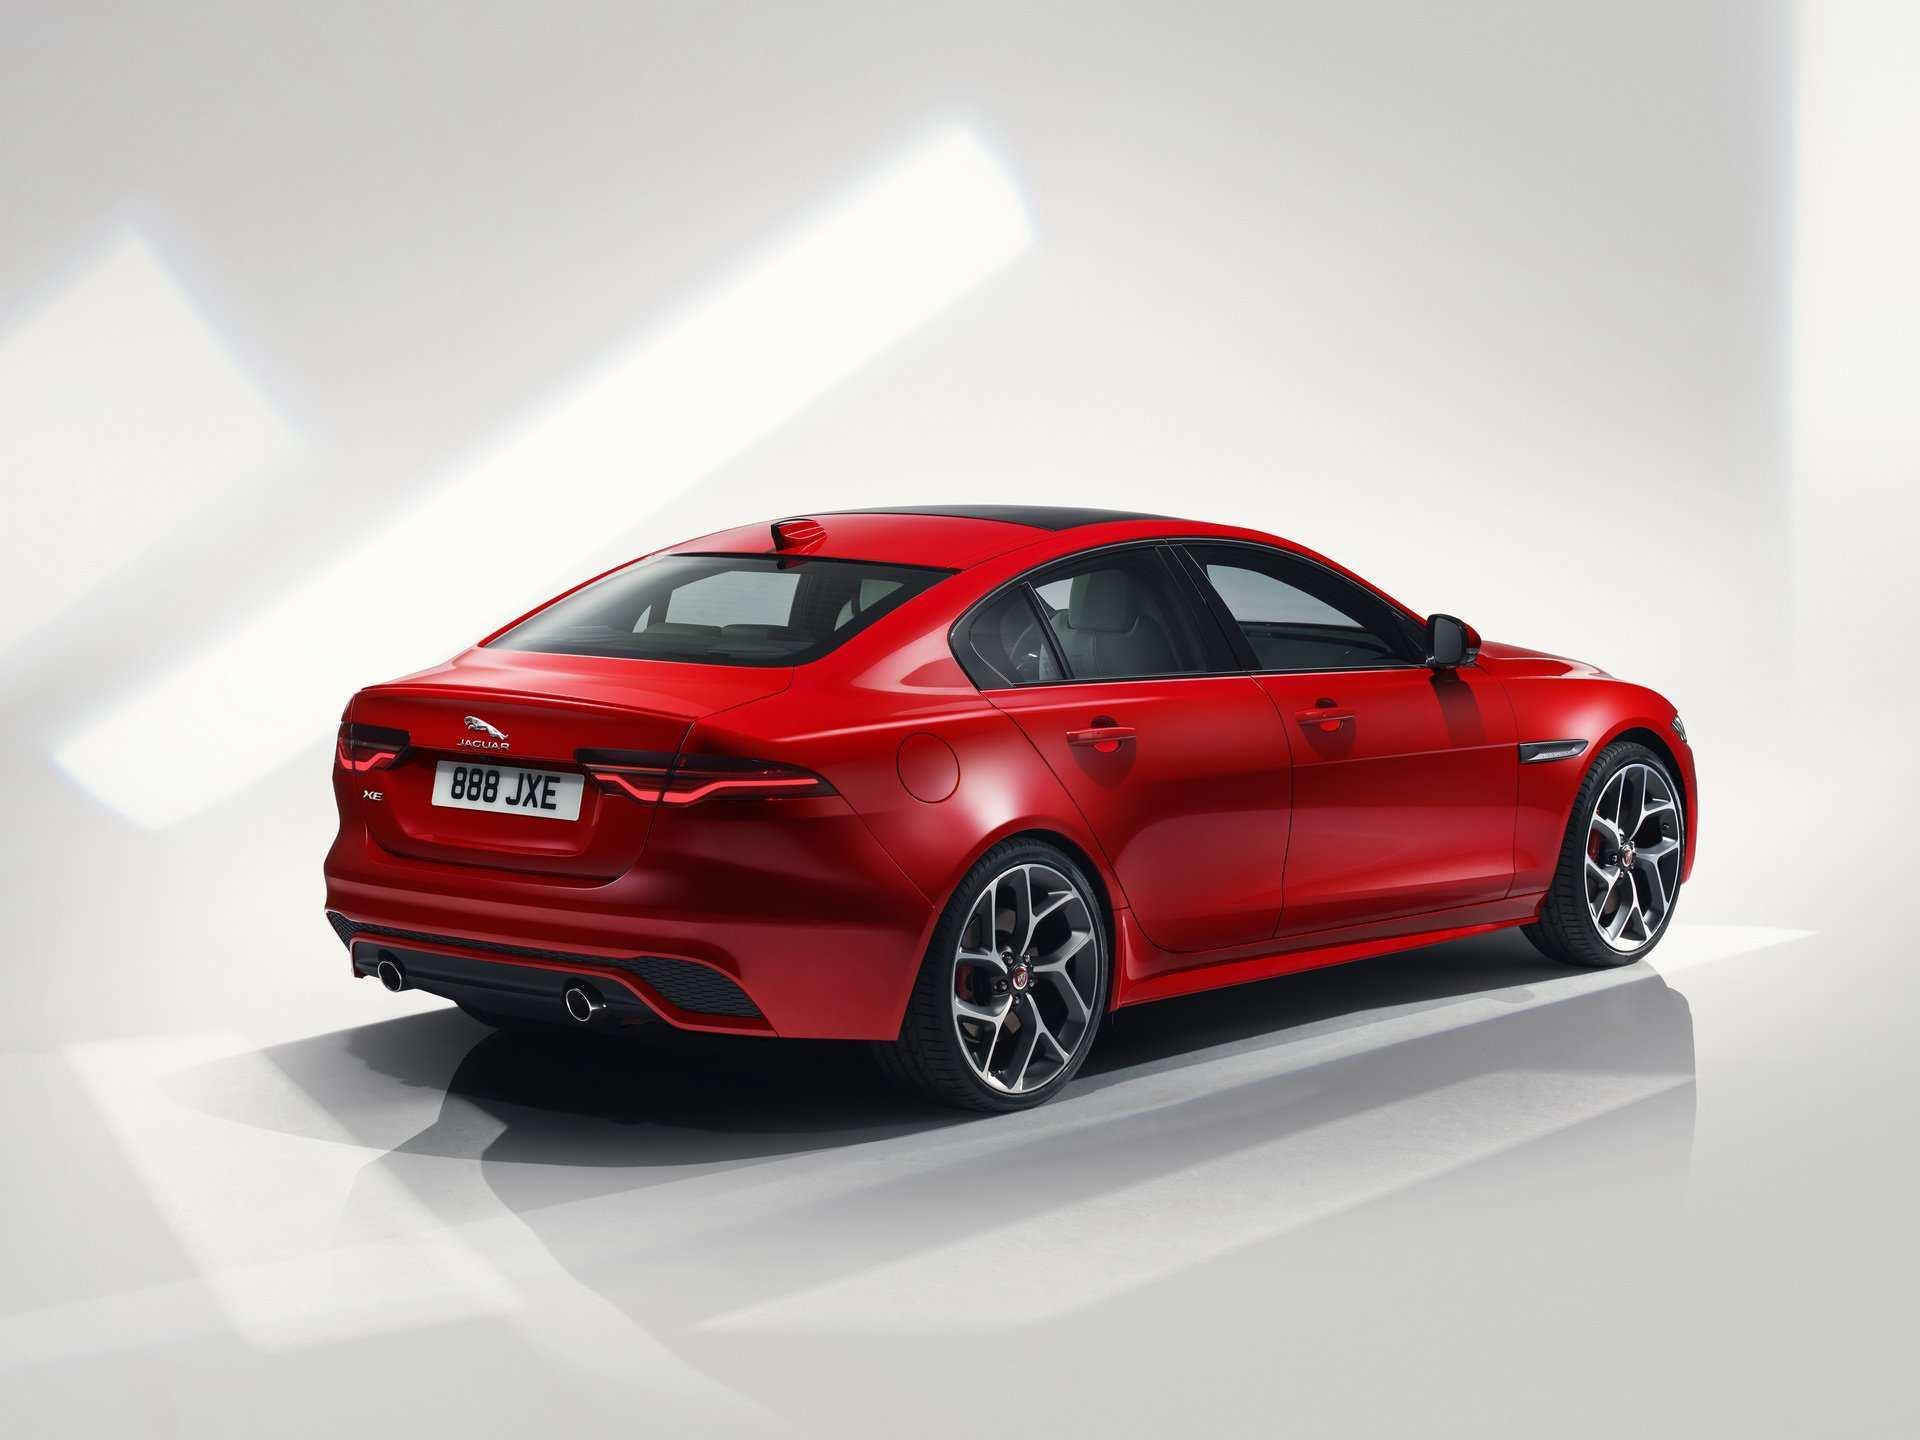 32 New Jaguar Xe Facelift 2020 New Concept for Jaguar Xe Facelift 2020